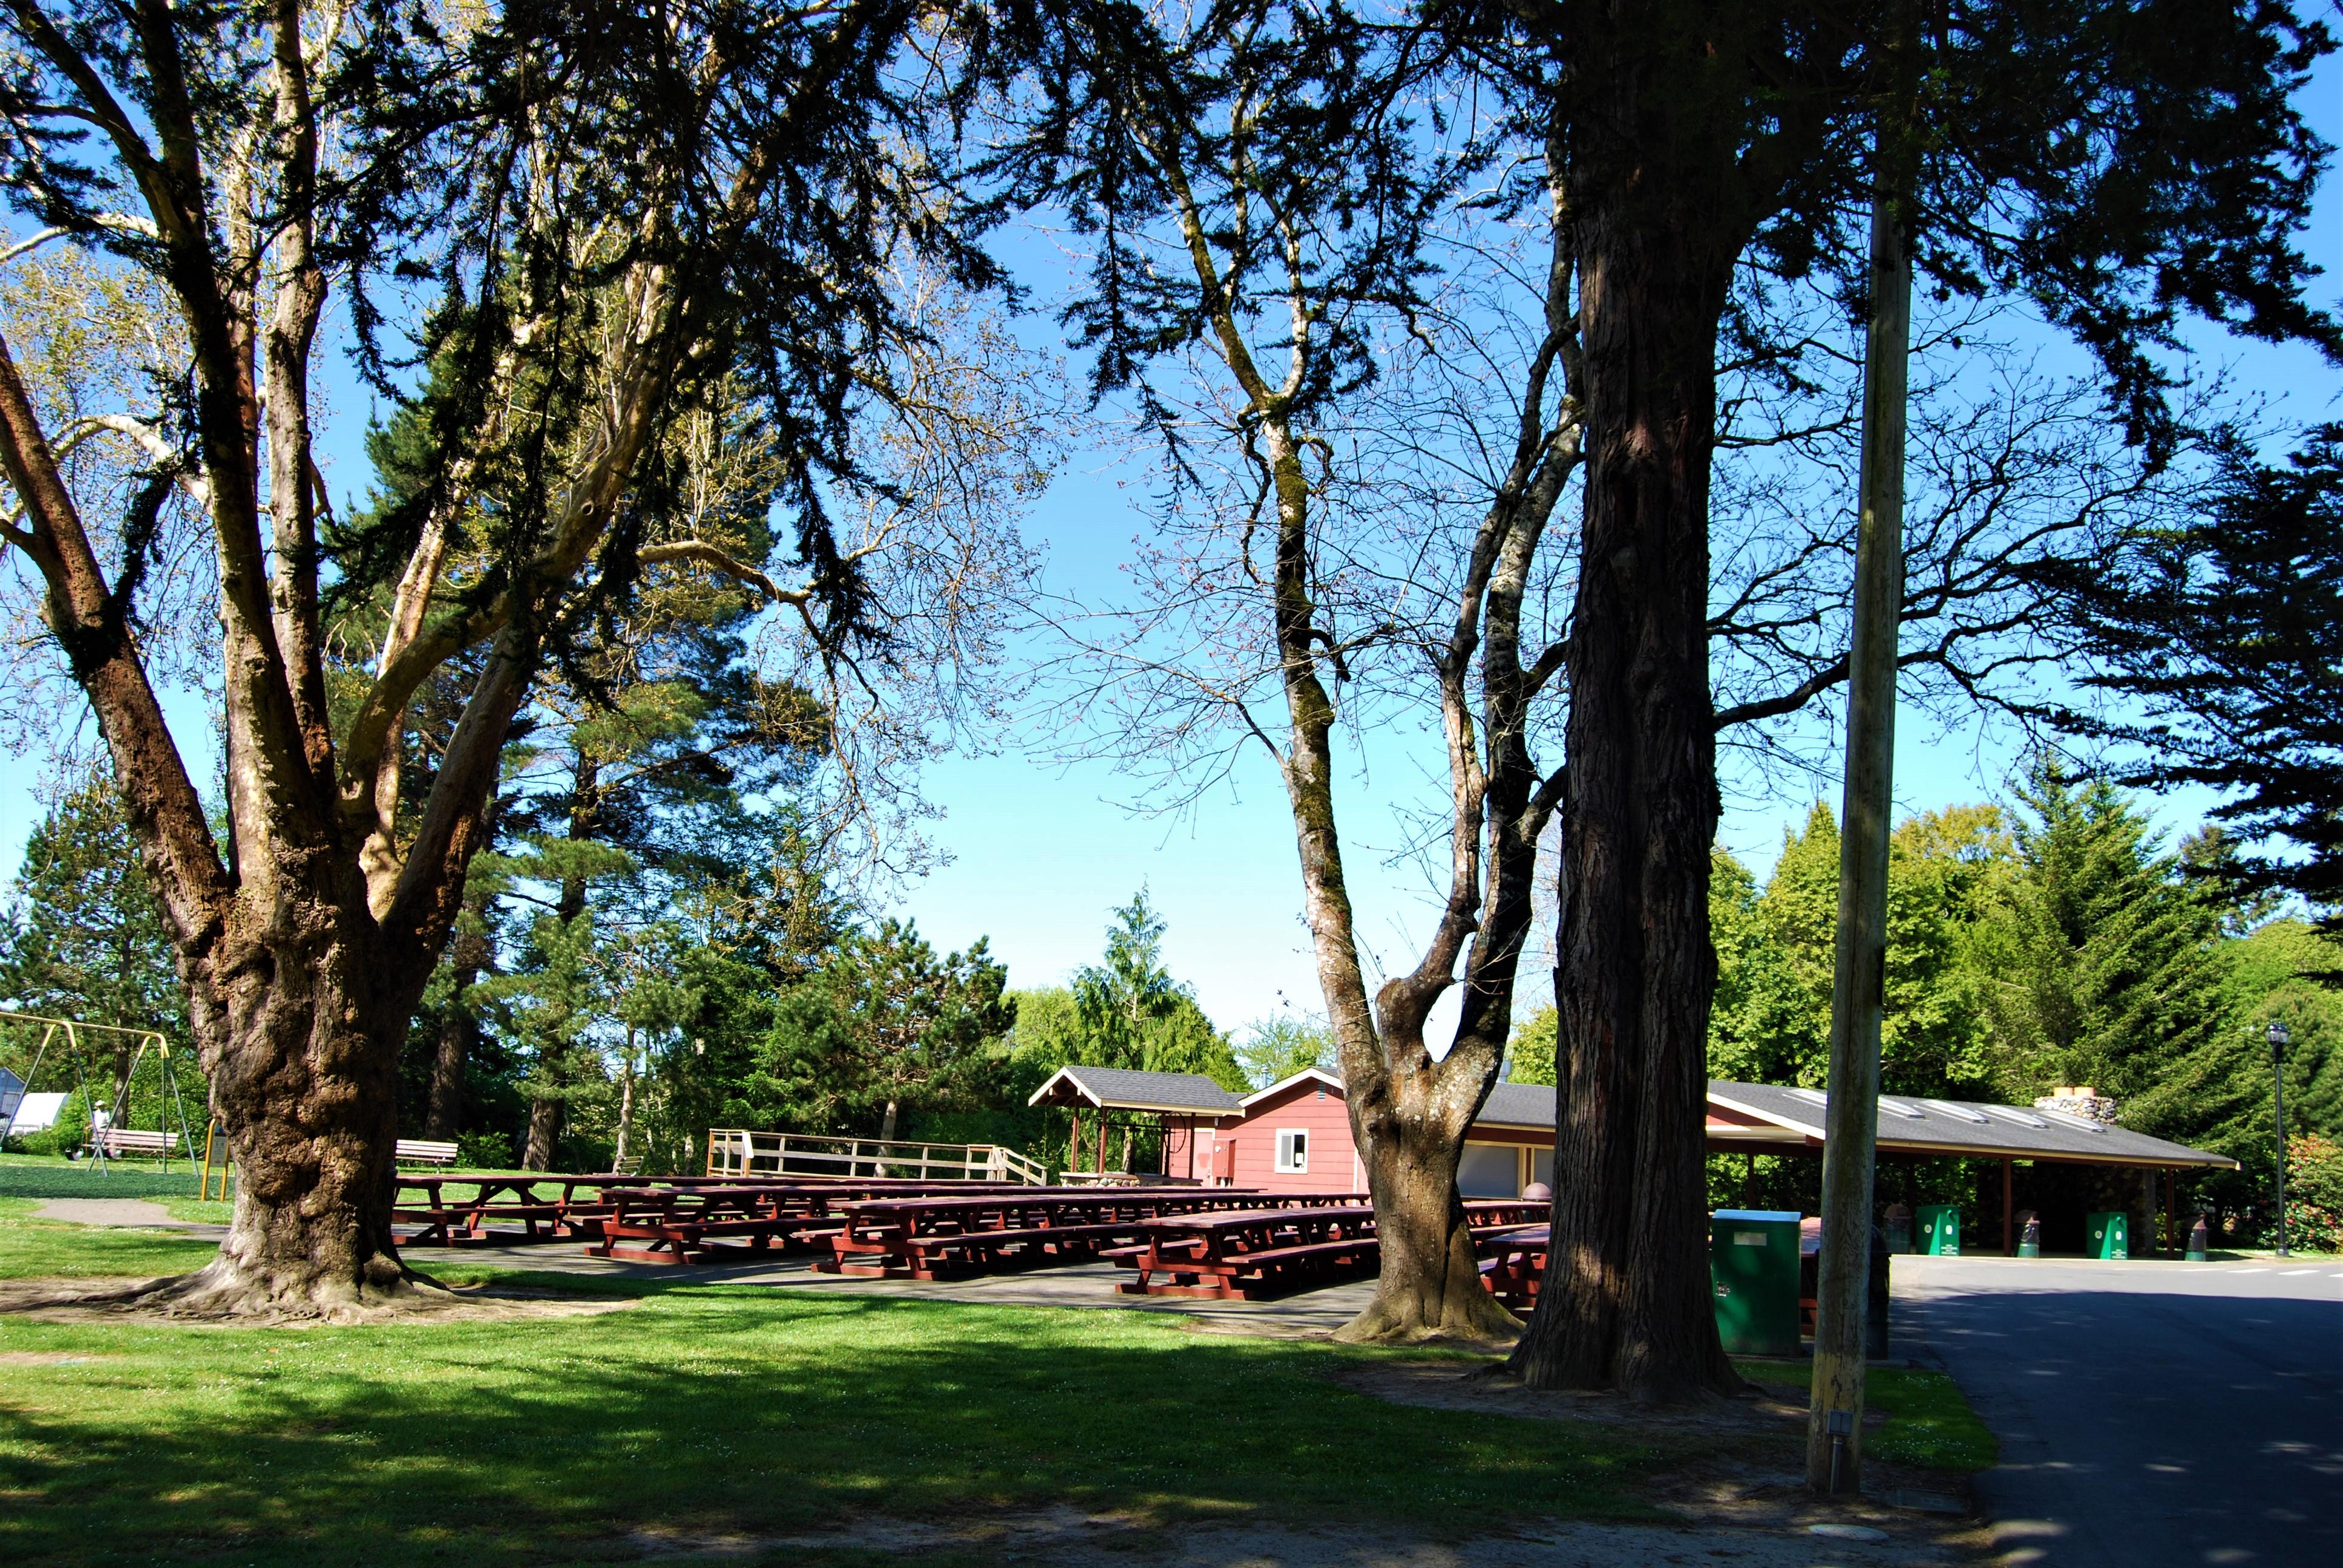 Rohner Park, Fortuna